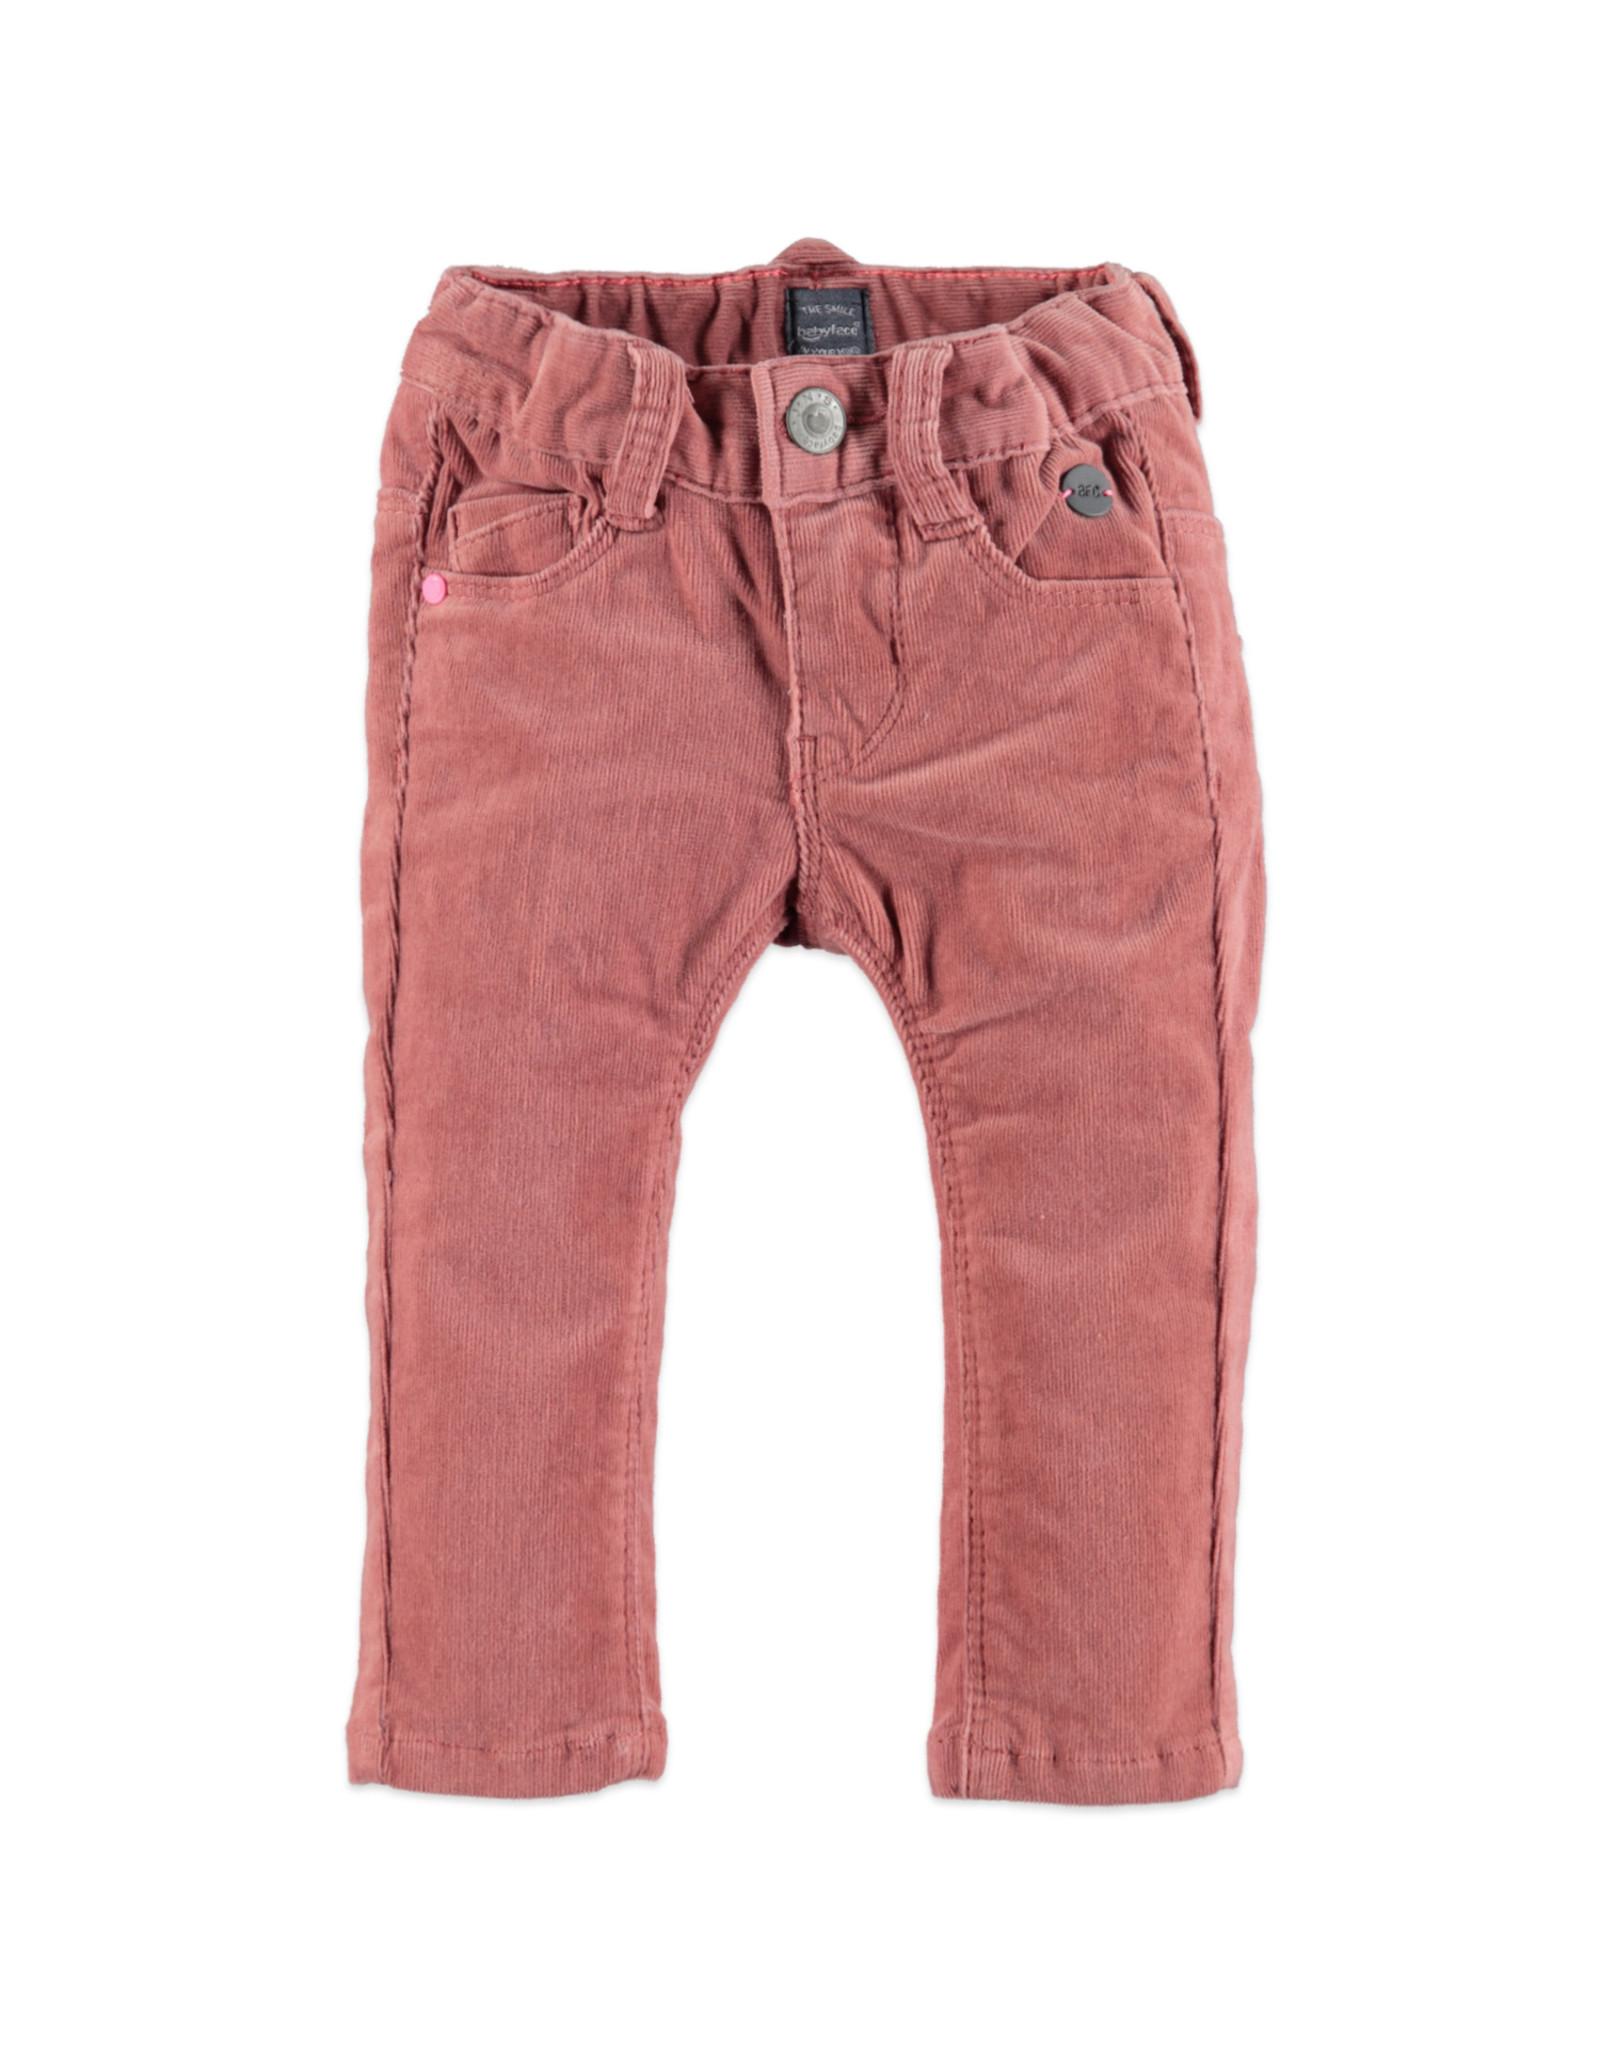 Babyface girls pants/dusty rose